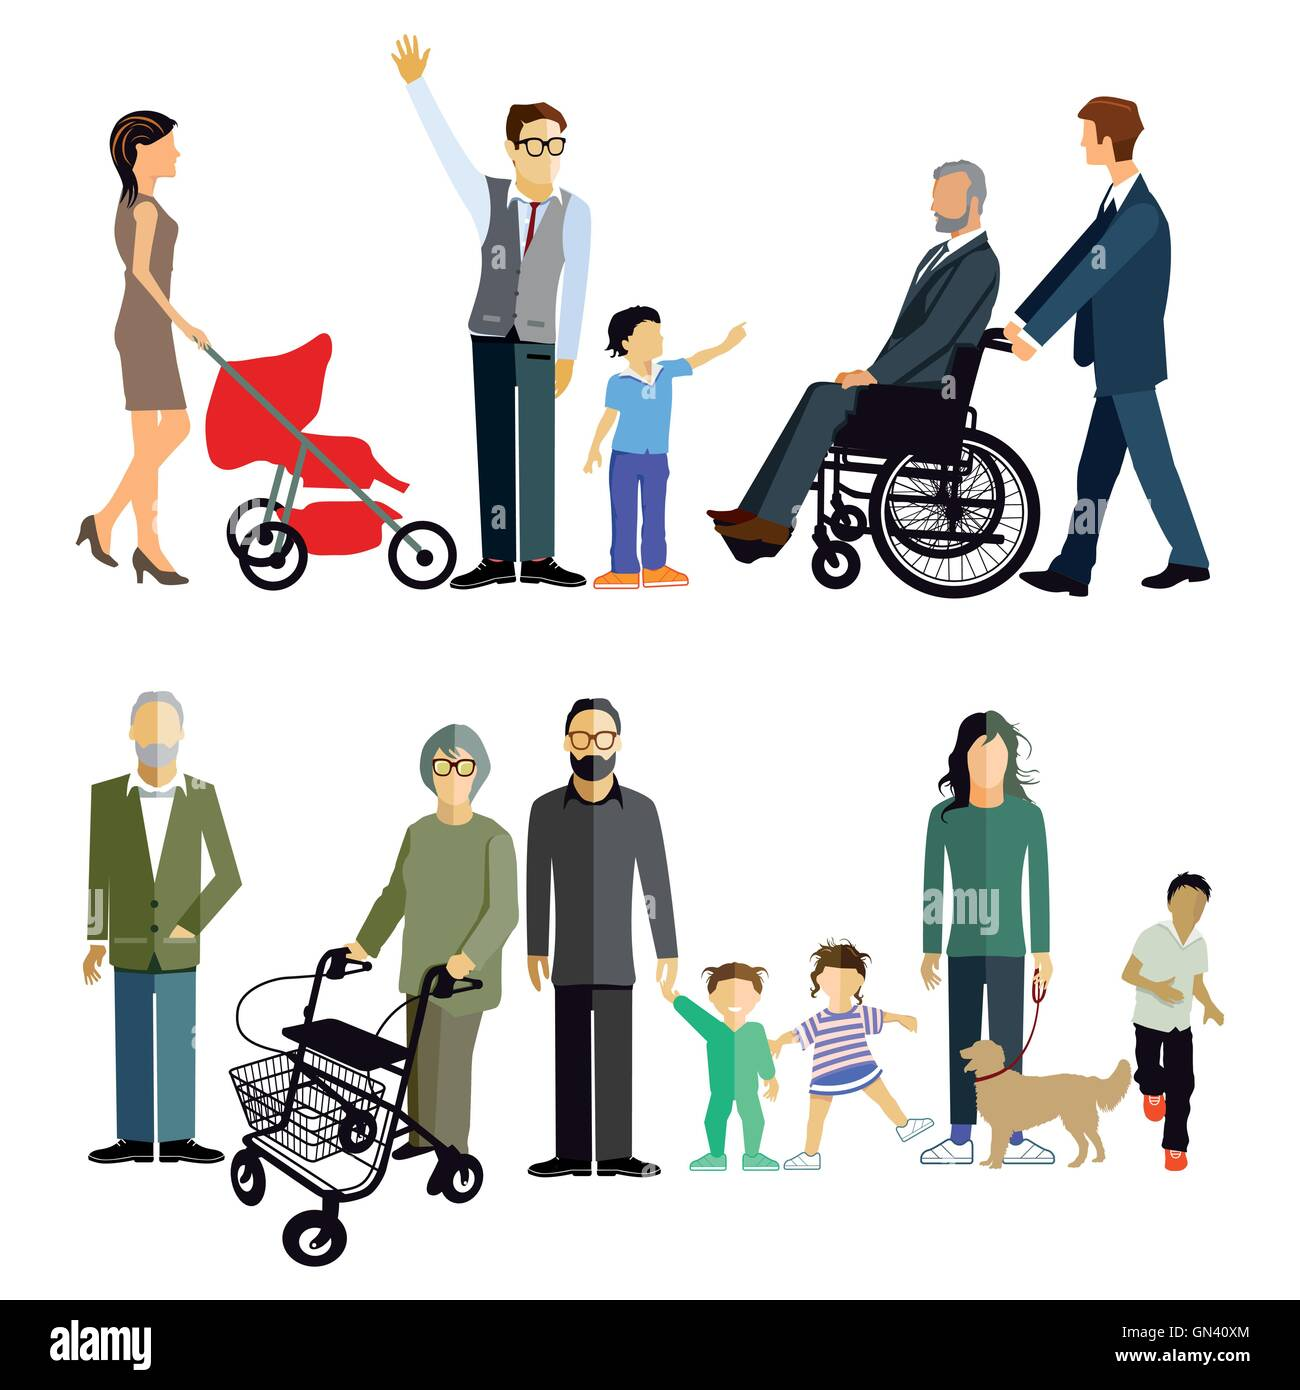 Family generations - Stock Image